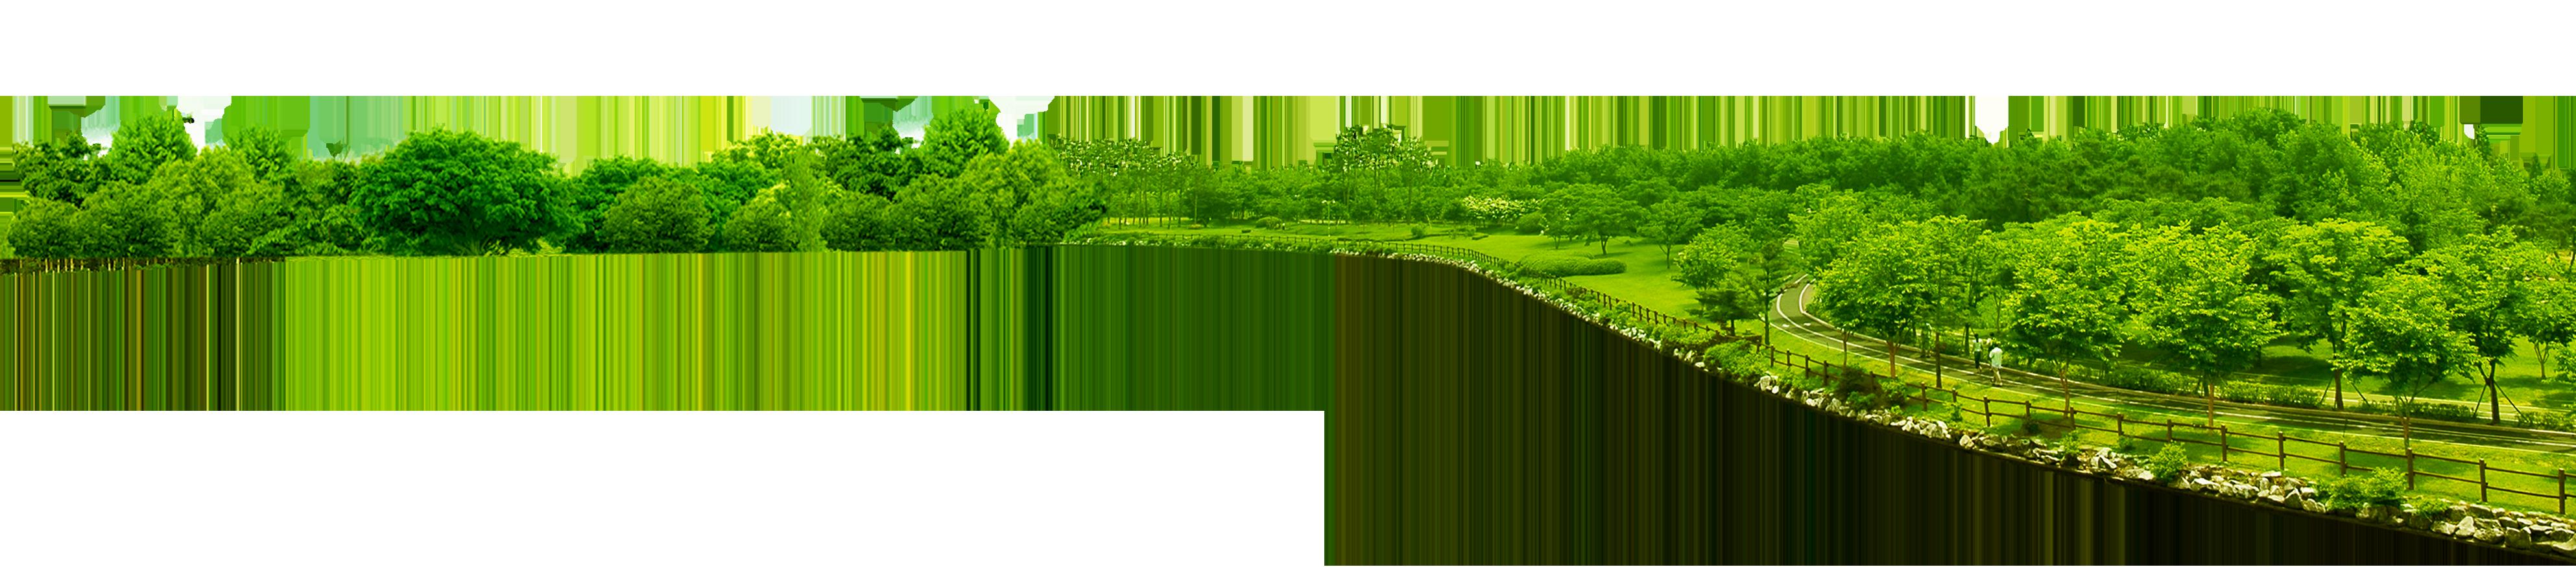 Clipart park natural environment. Green tree clip art